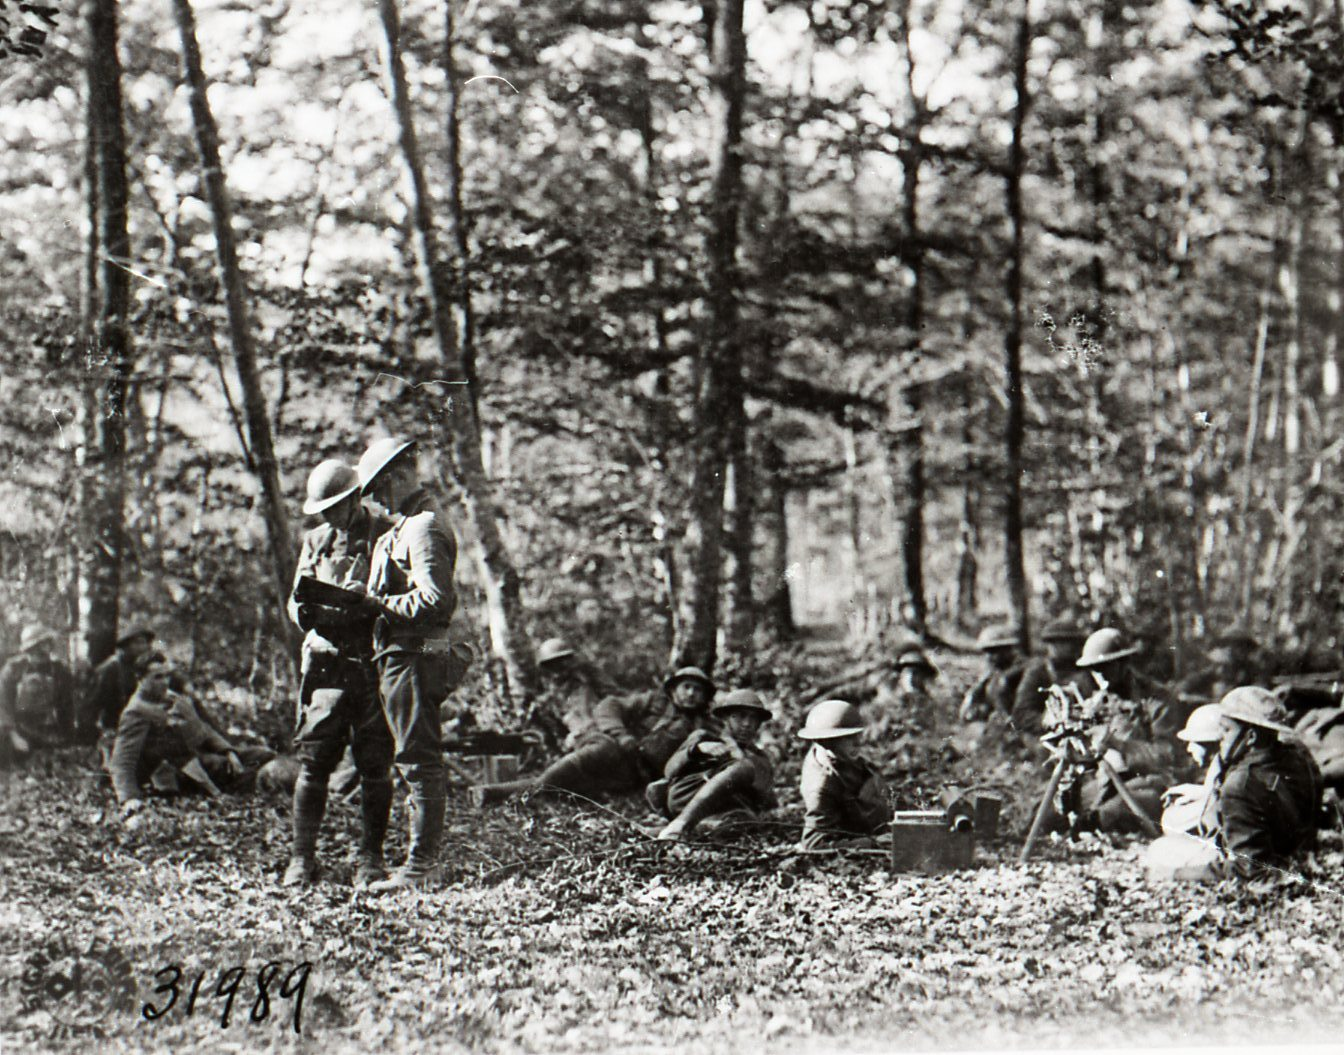 059 317th Infantry Regiment in France.jpg